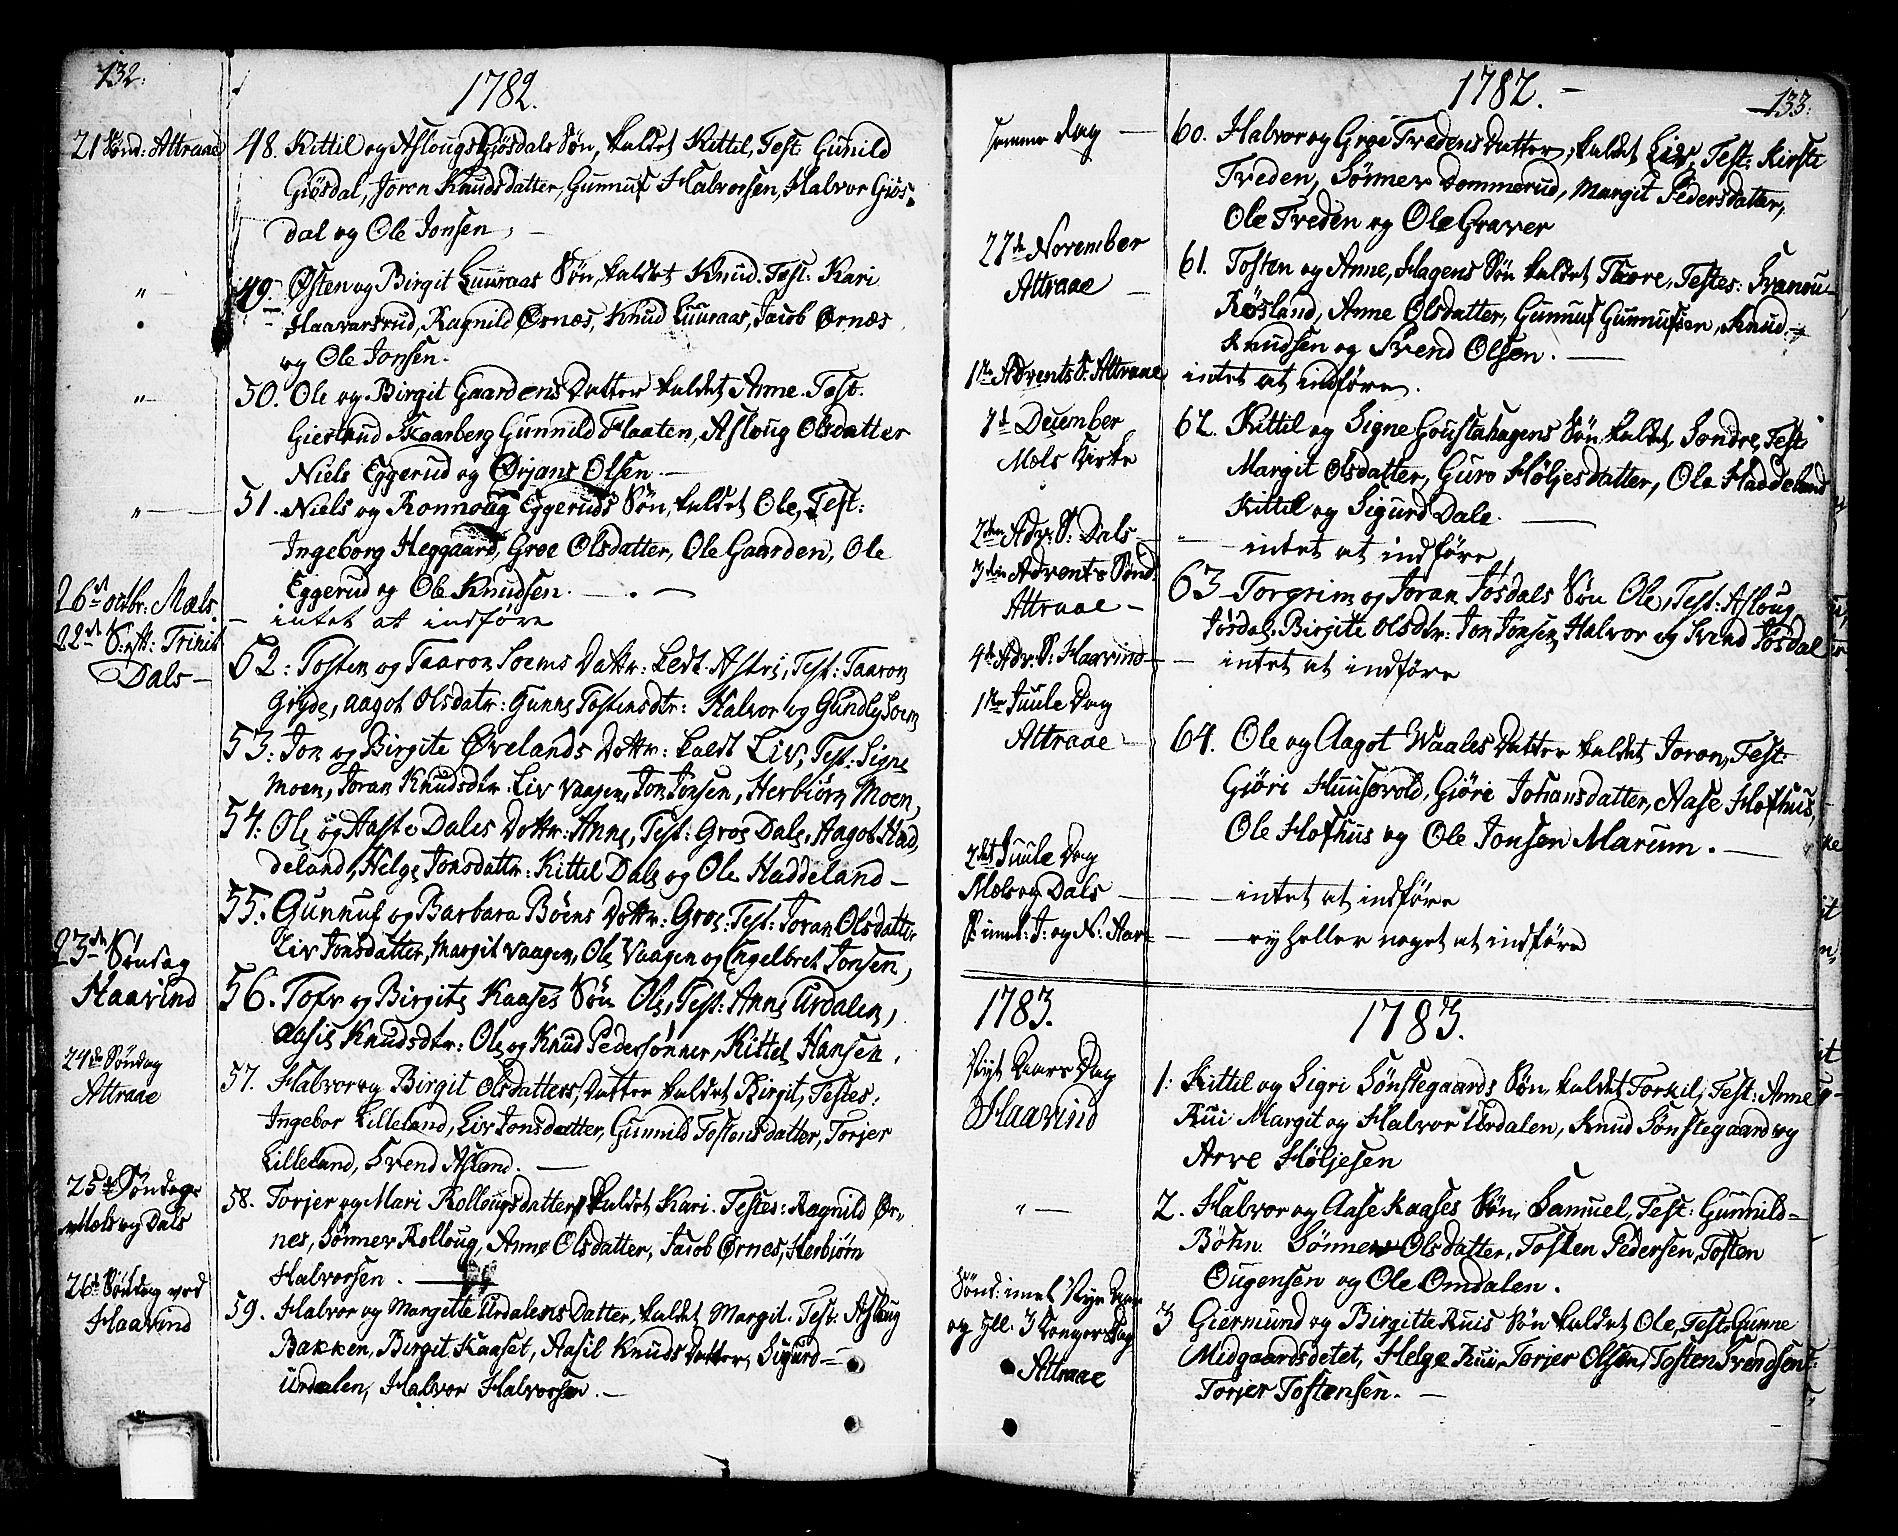 SAKO, Tinn kirkebøker, F/Fa/L0002: Ministerialbok nr. I 2, 1757-1810, s. 132-133